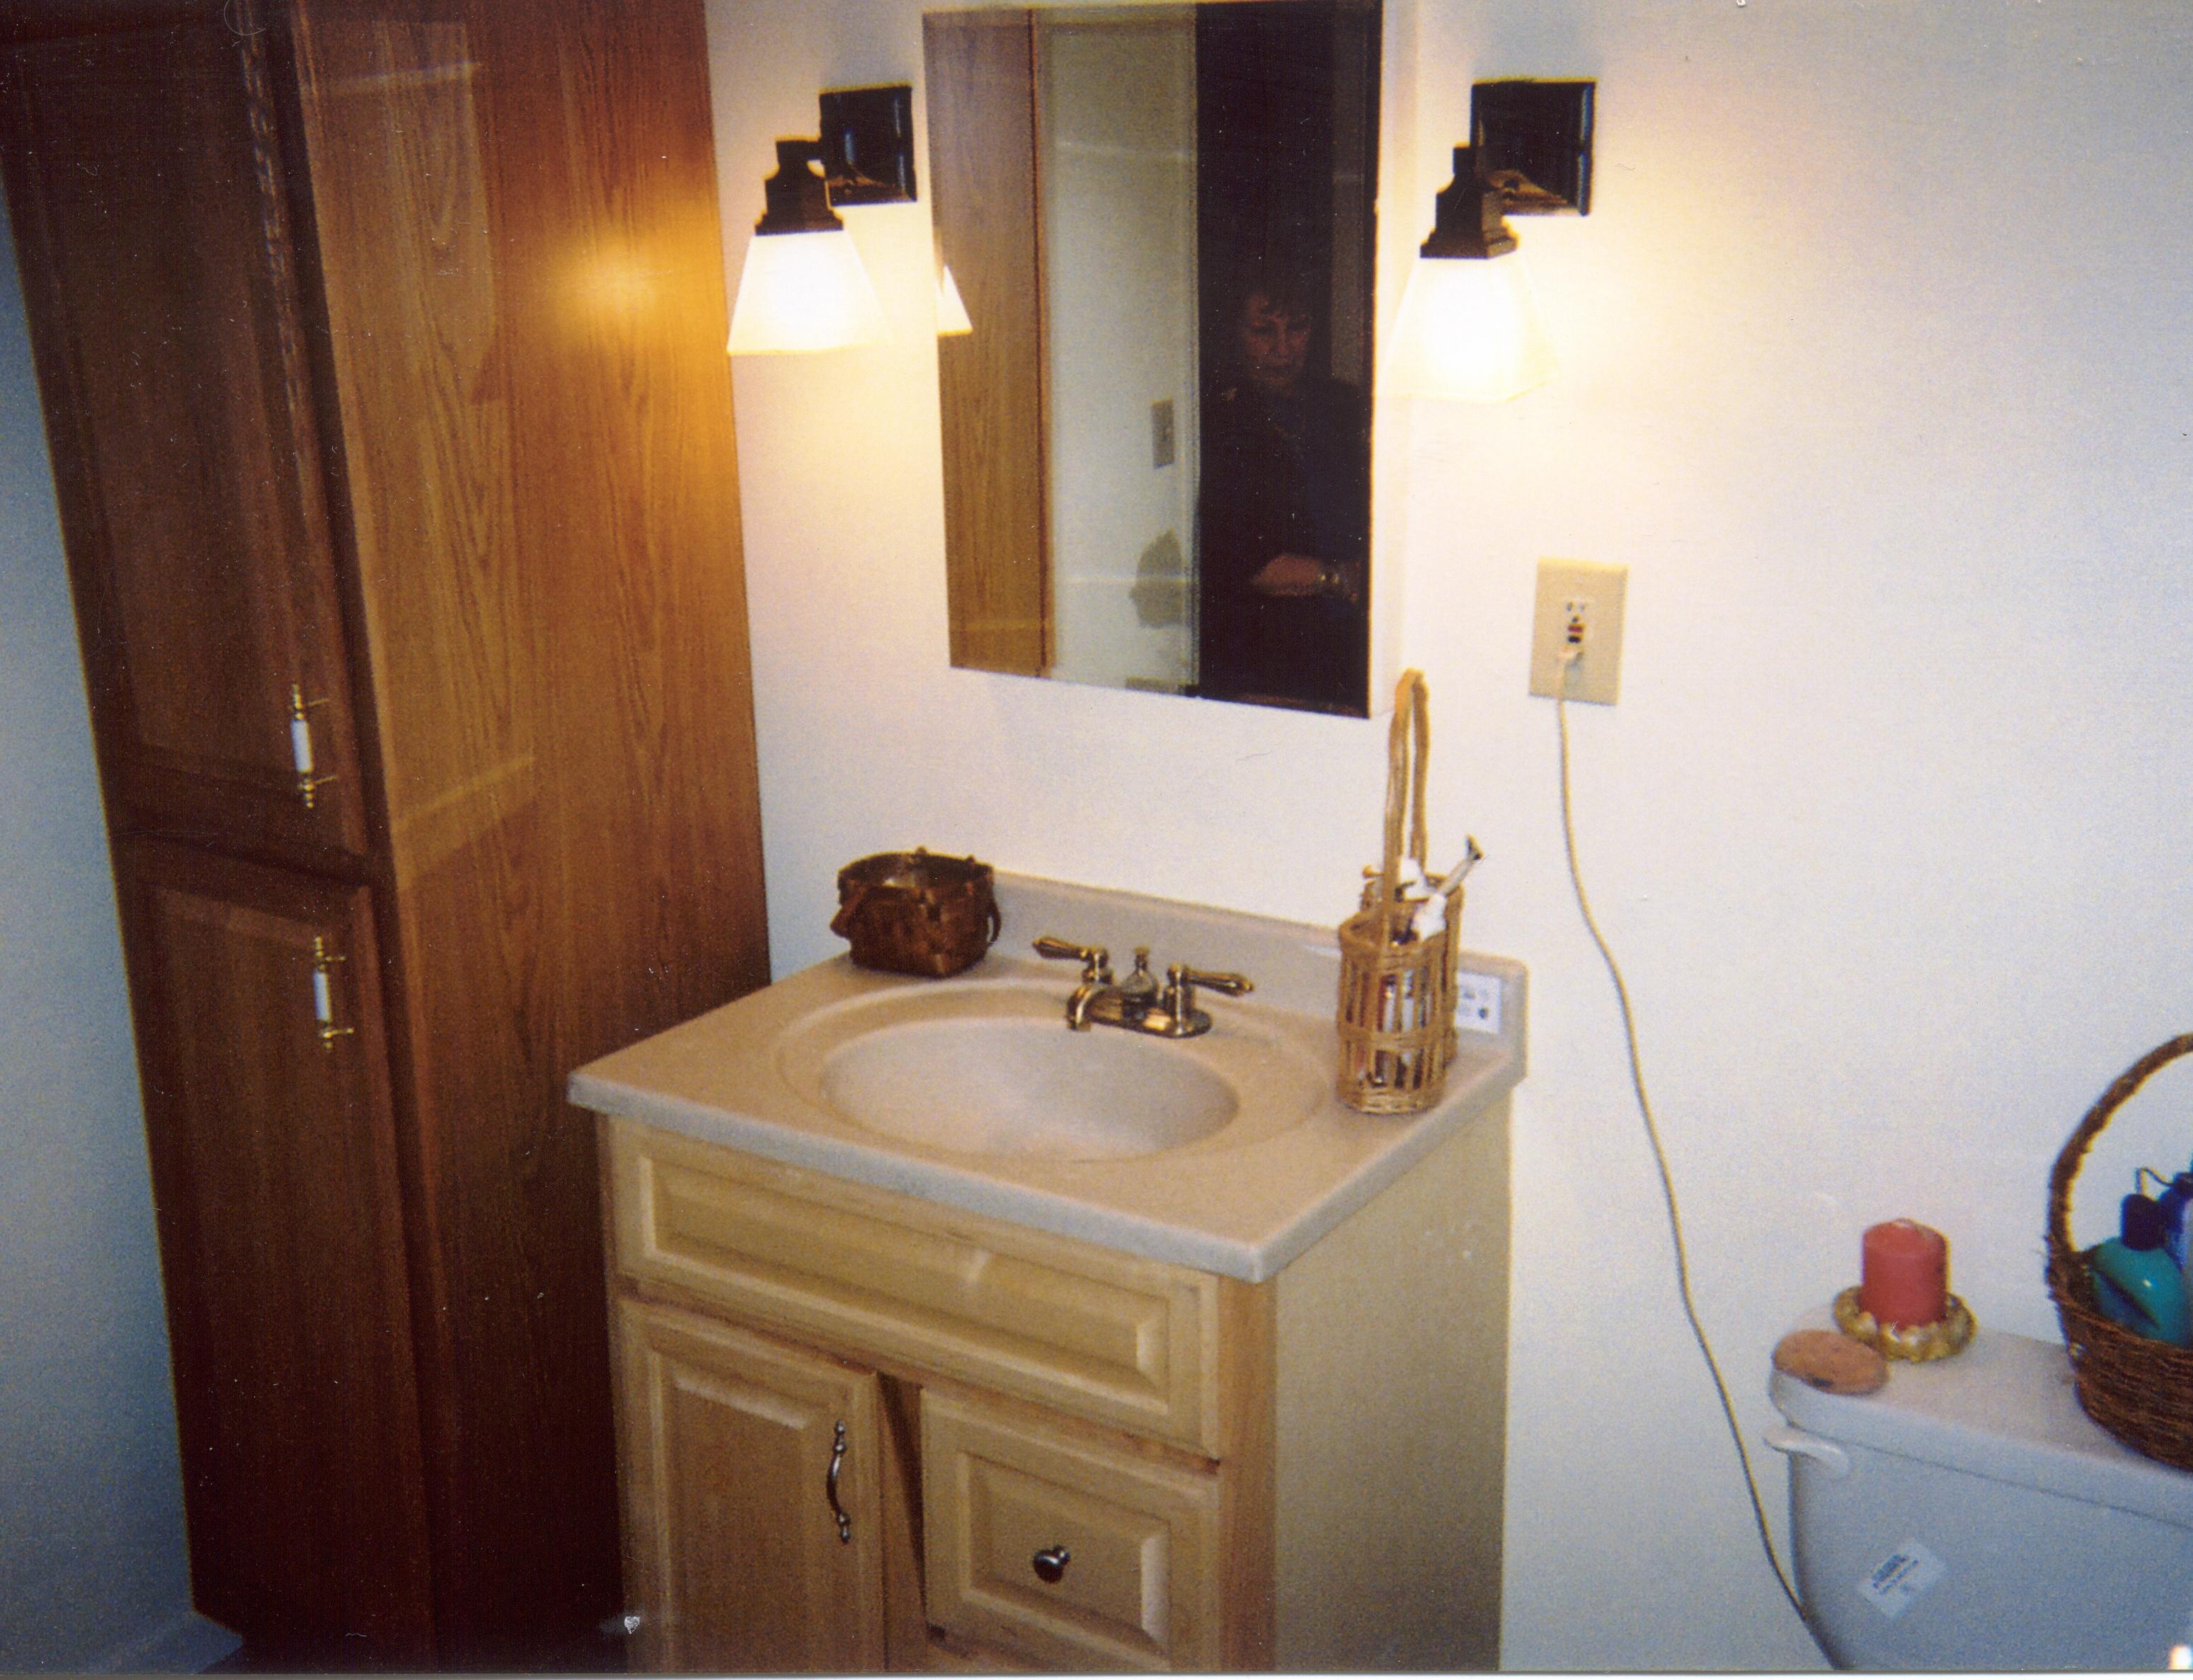 Bathroom remodeling with tub, vanity and toilet.